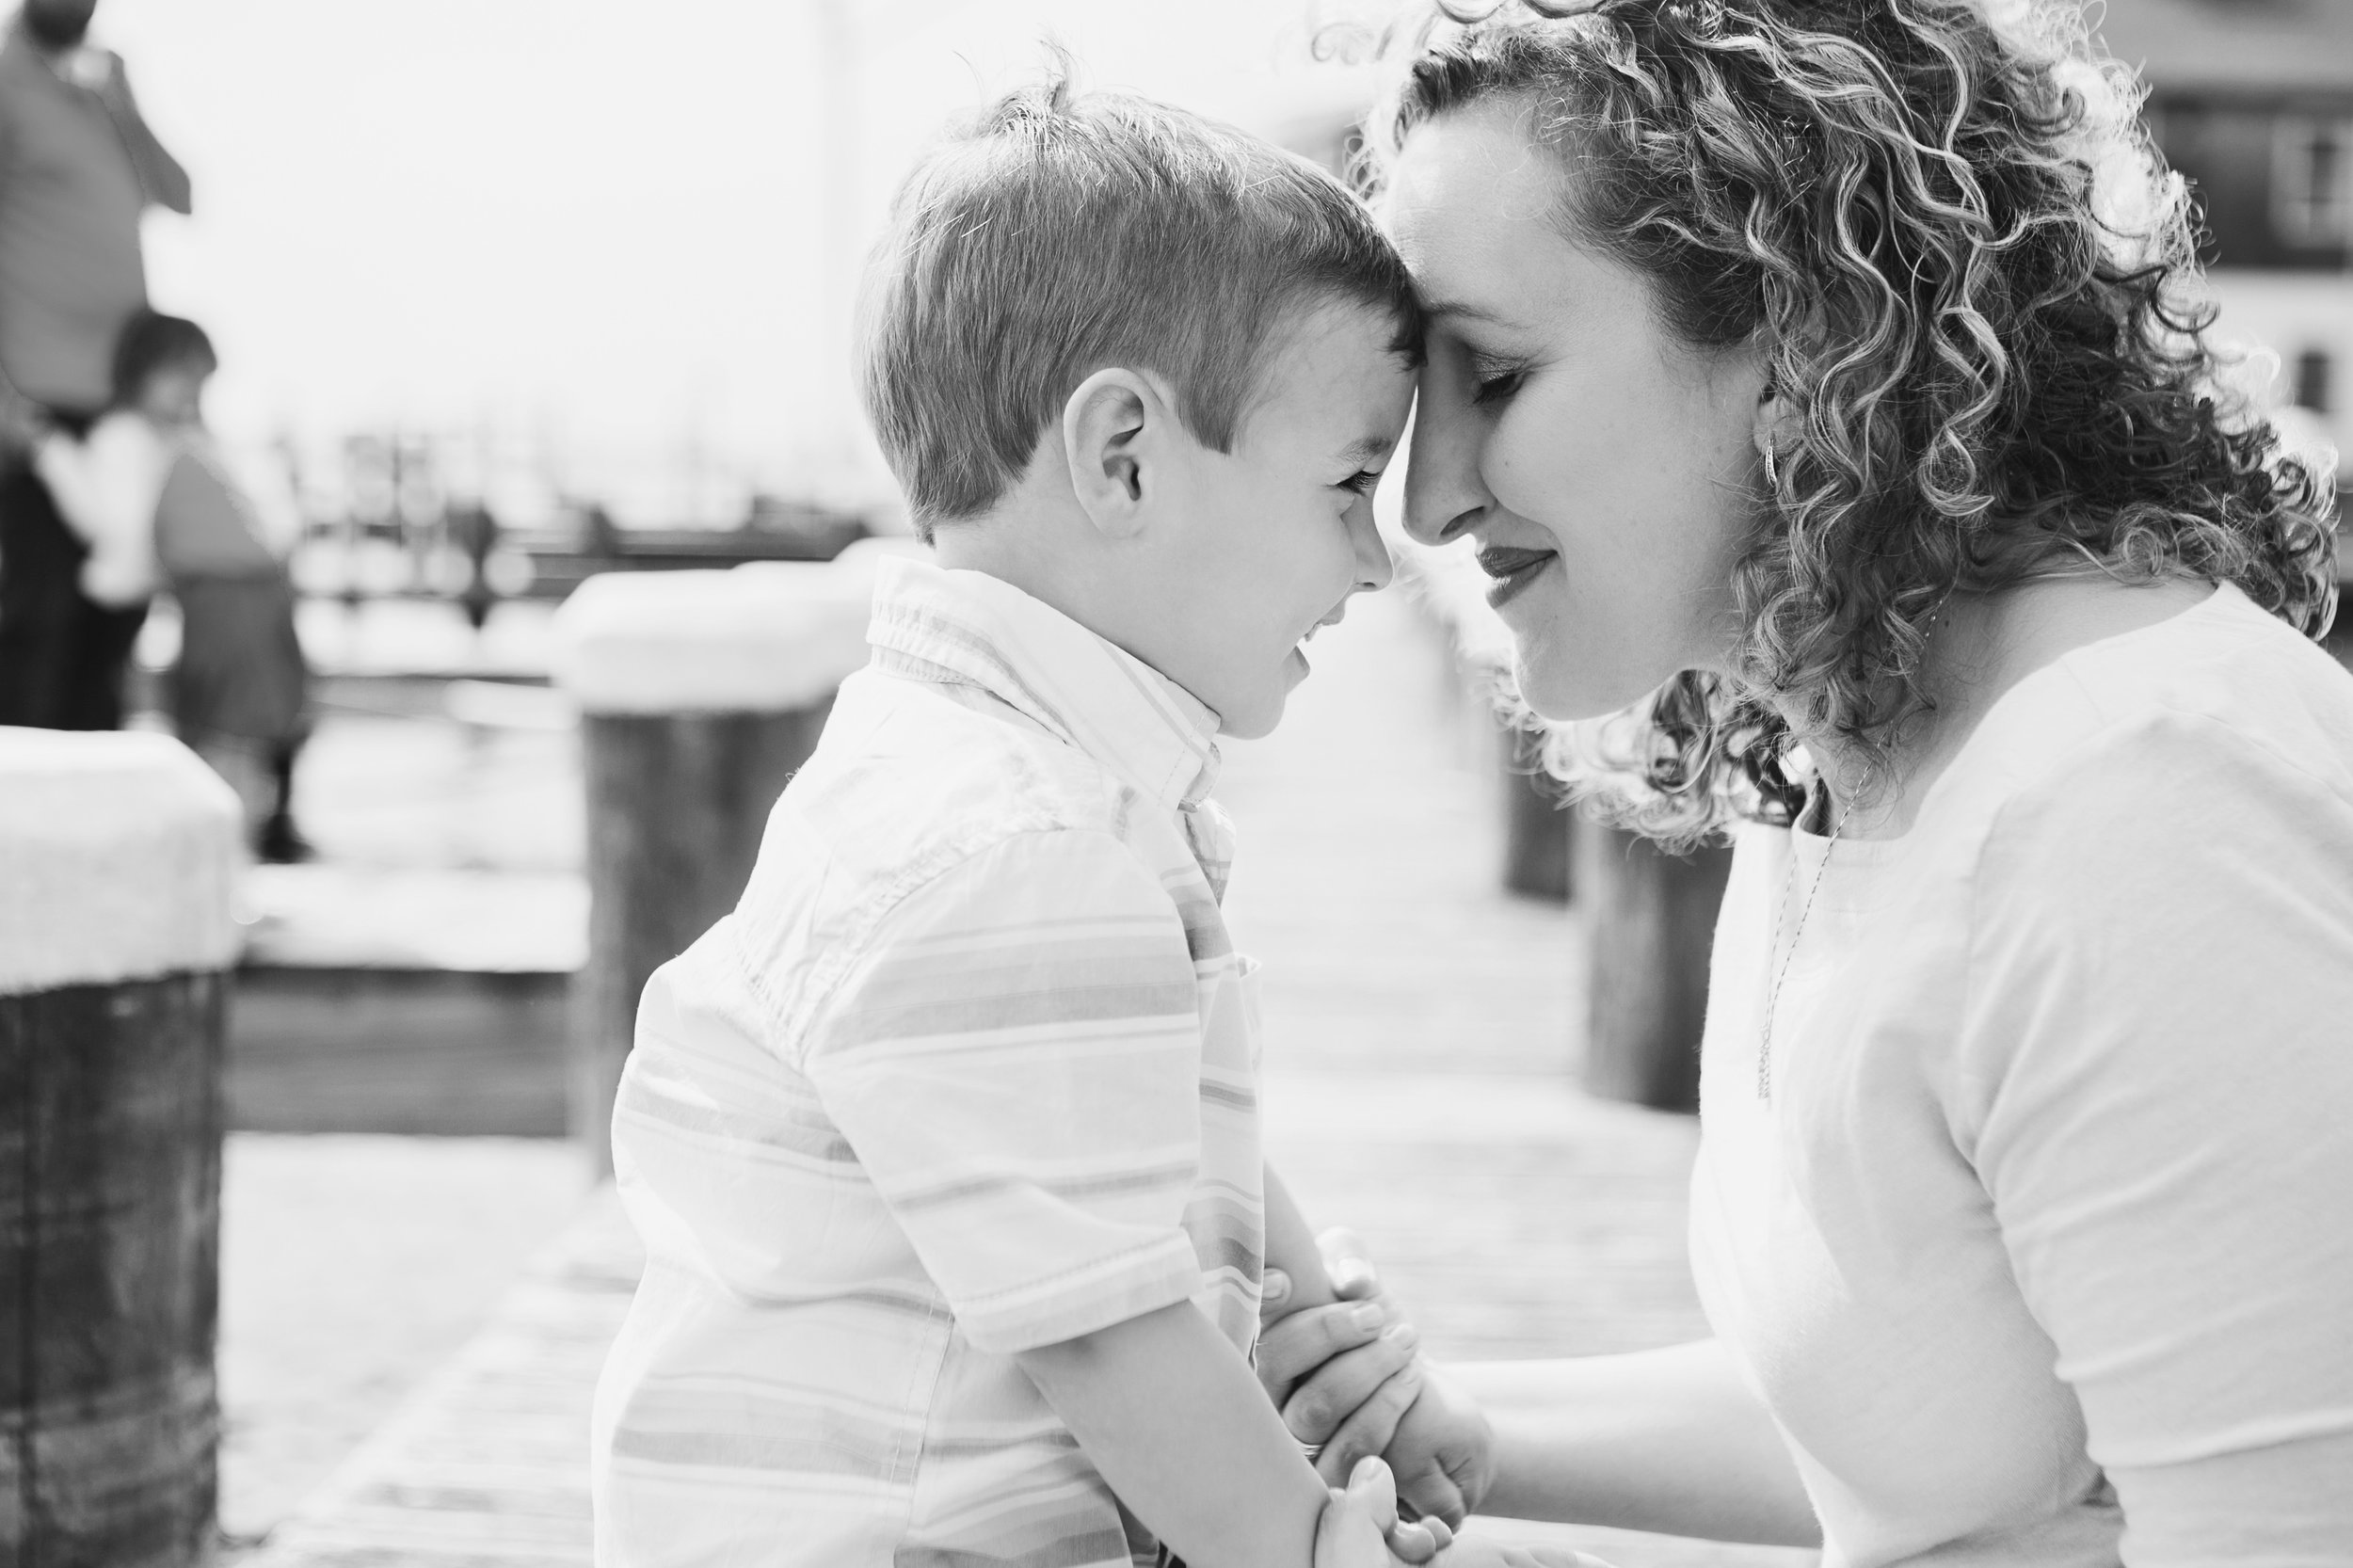 CindyGiovagnoliPhotography_Seattle_Washington_PNW_Family_Childrens_Portraits_Photography-006.jpg